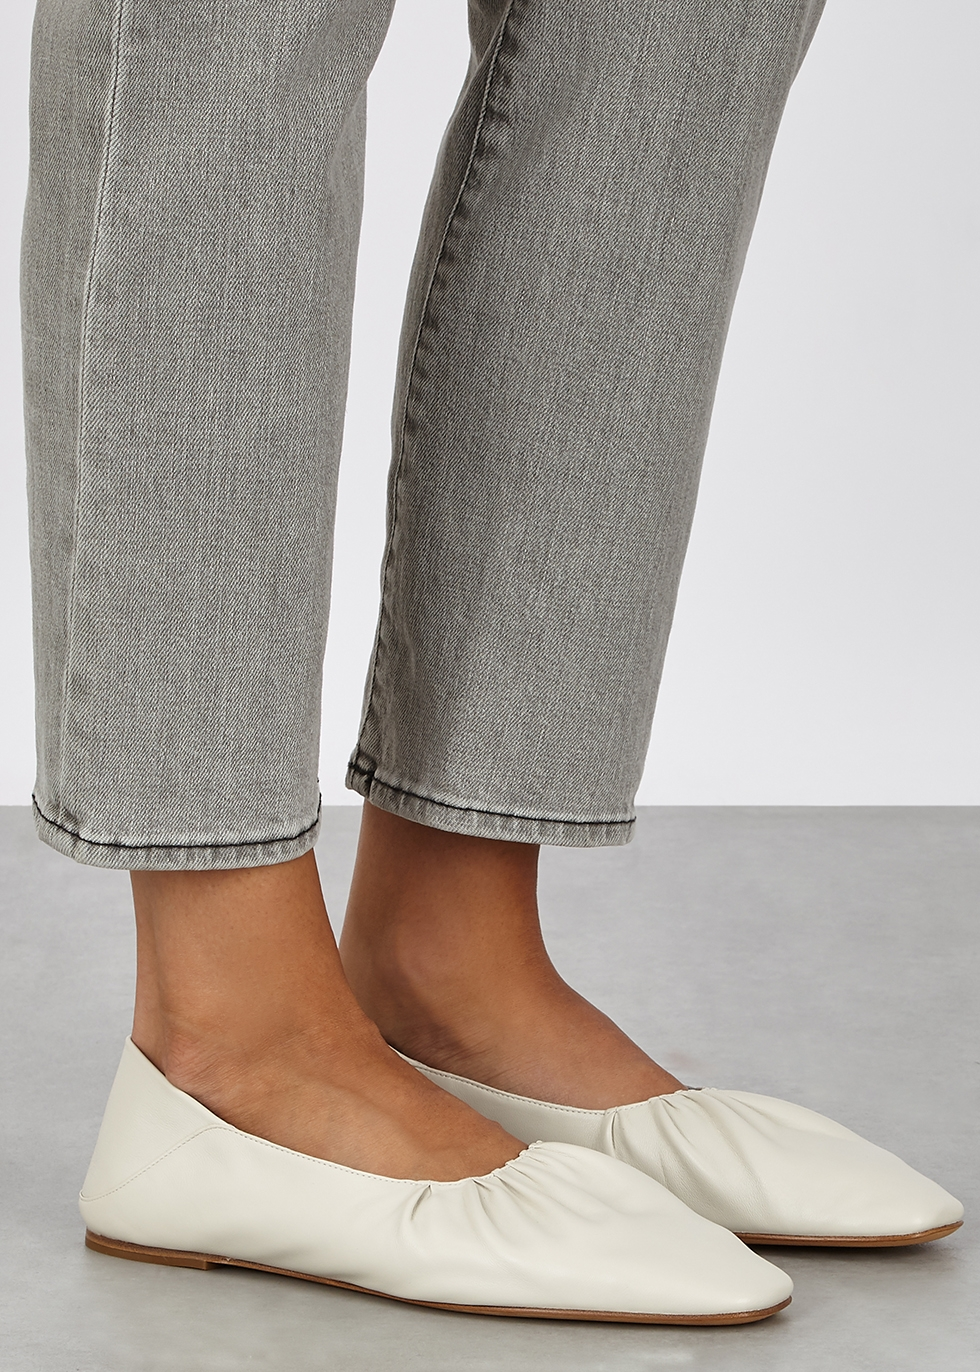 Women's Designer Flats - Flat Shoes